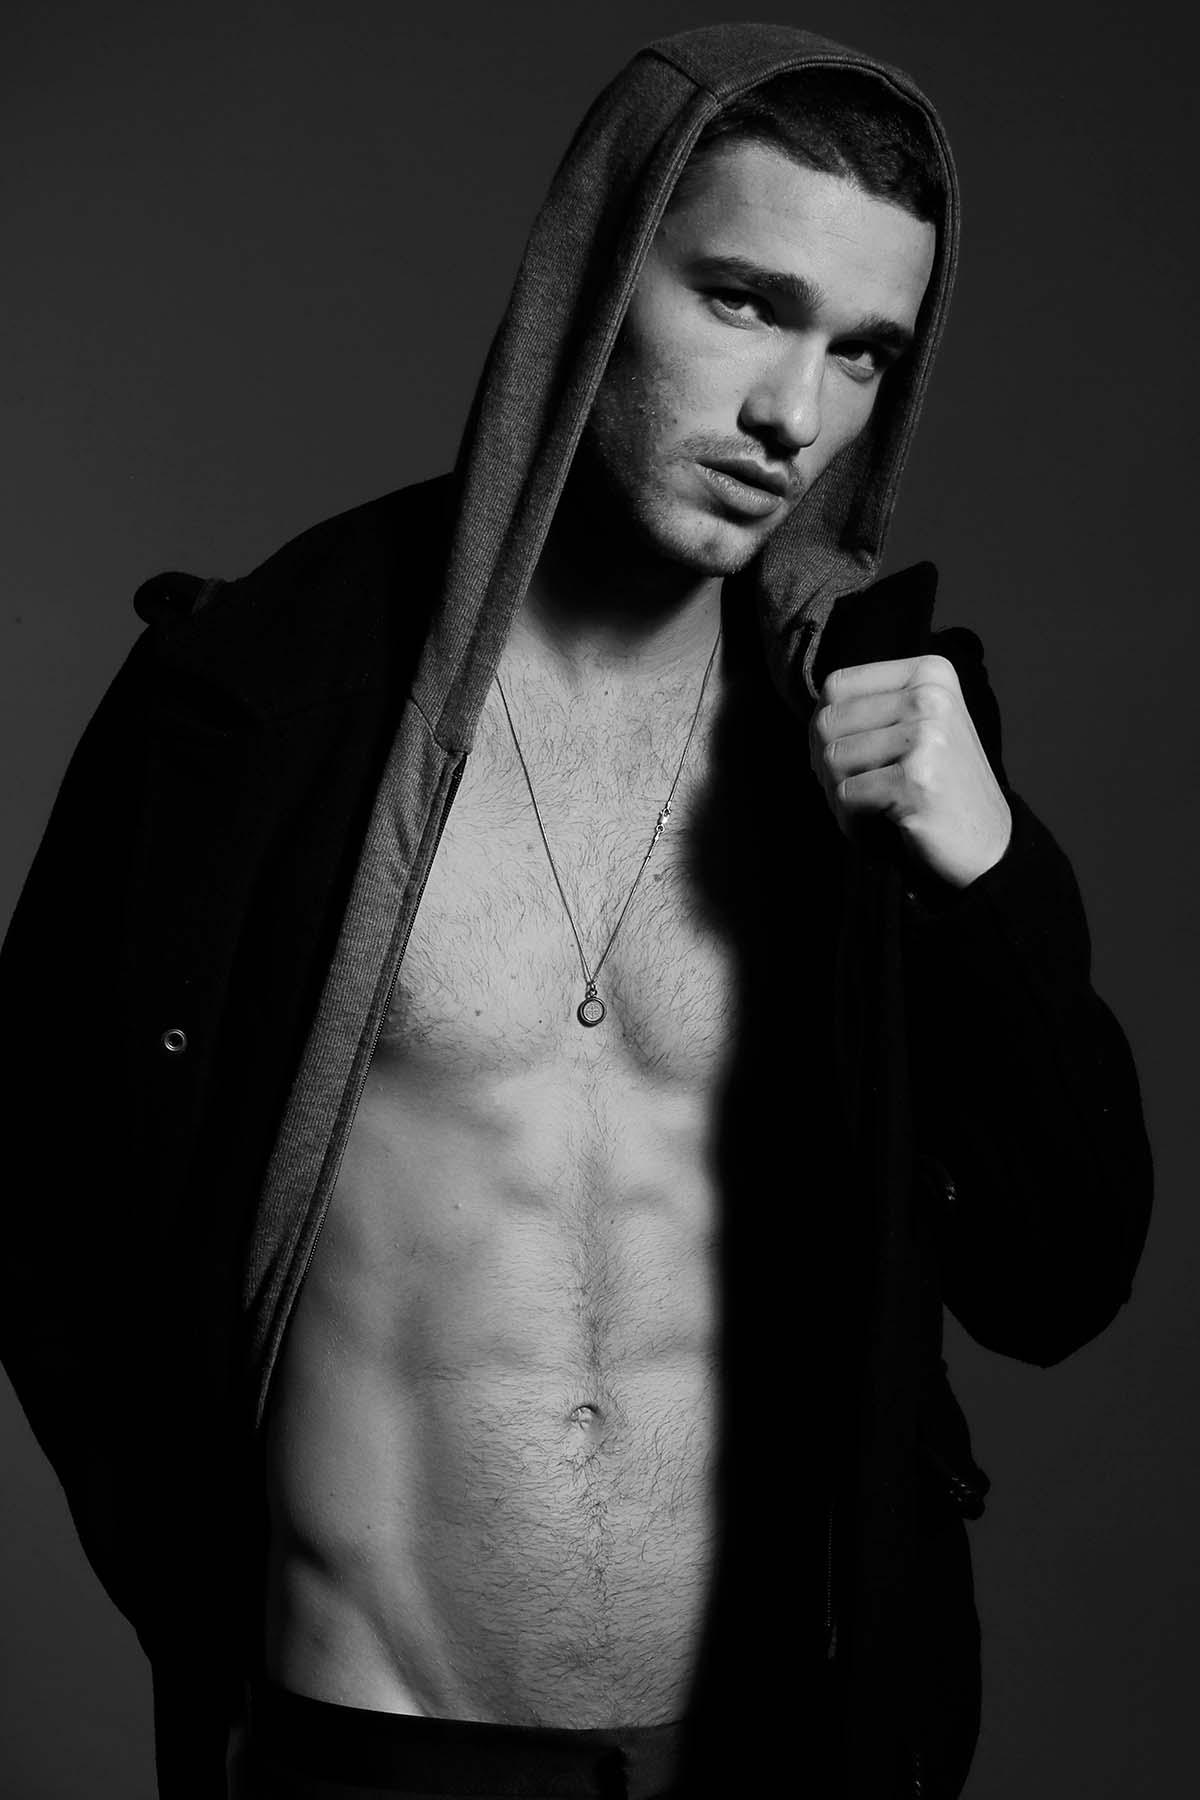 Luigi Ficarelli by Omer Faraj for Brazilian Male Model